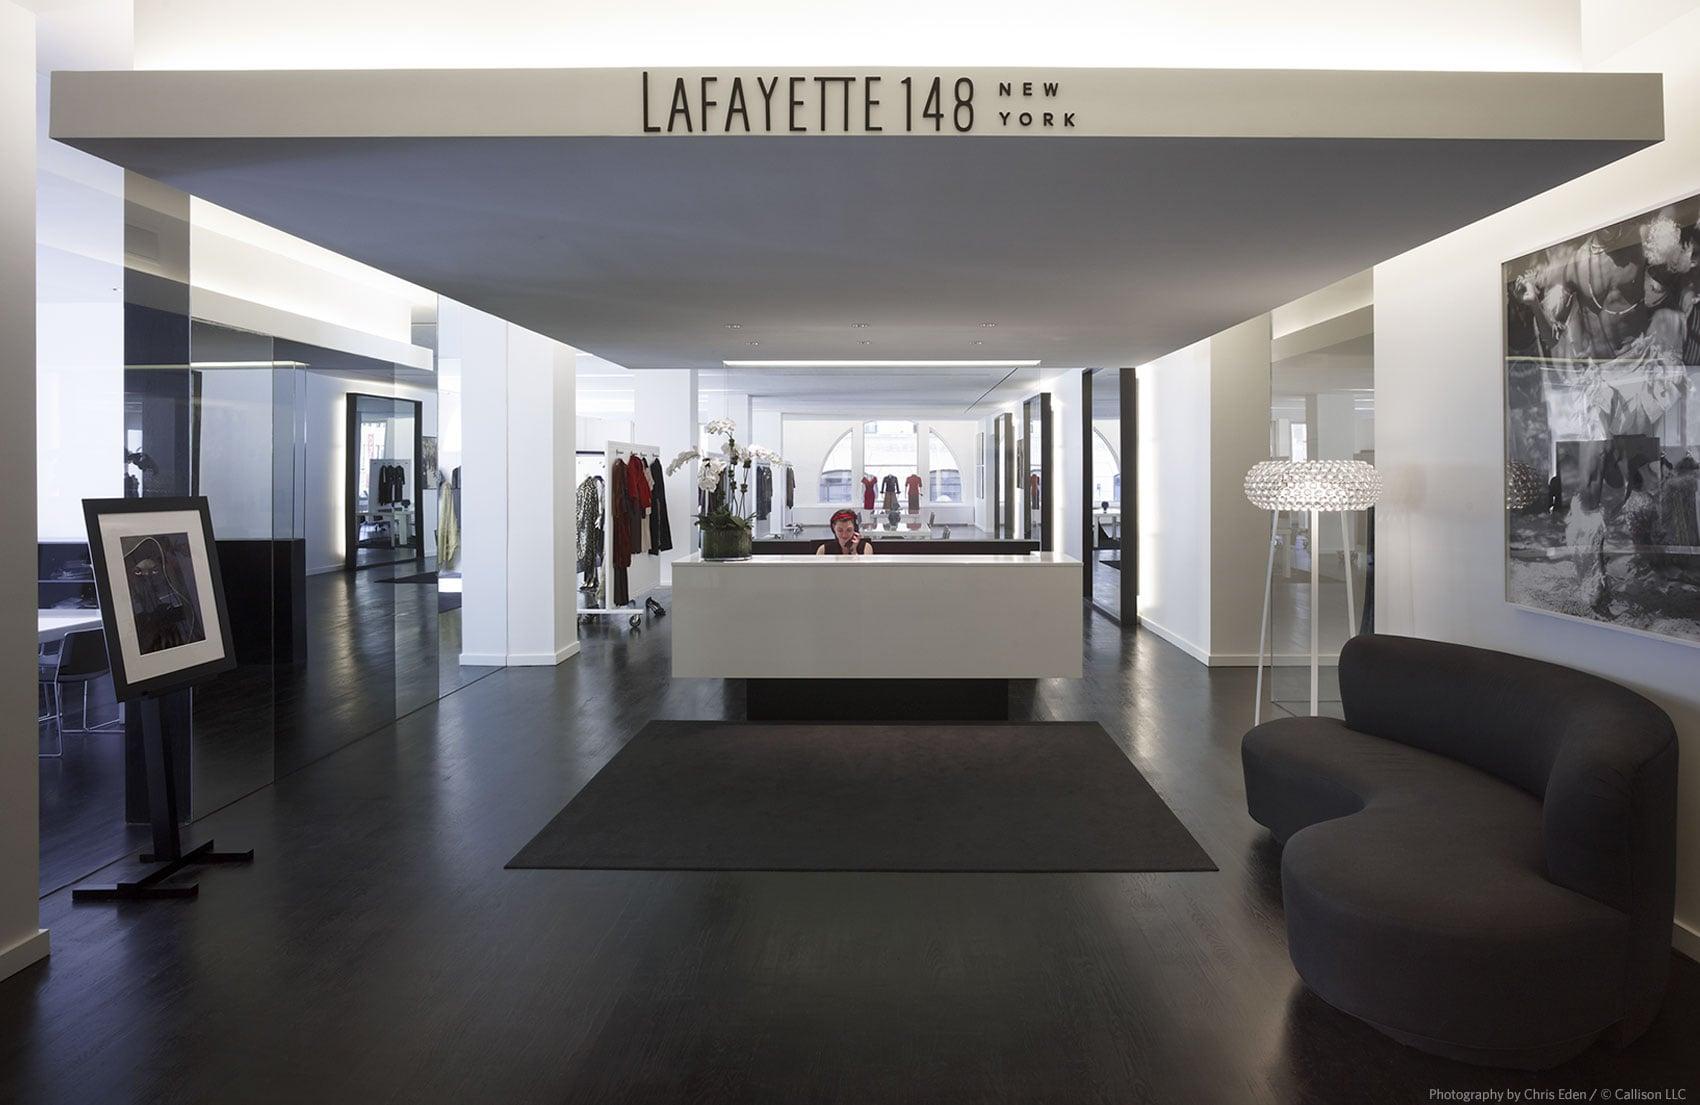 Lafayette148 Showroom - Reception interior